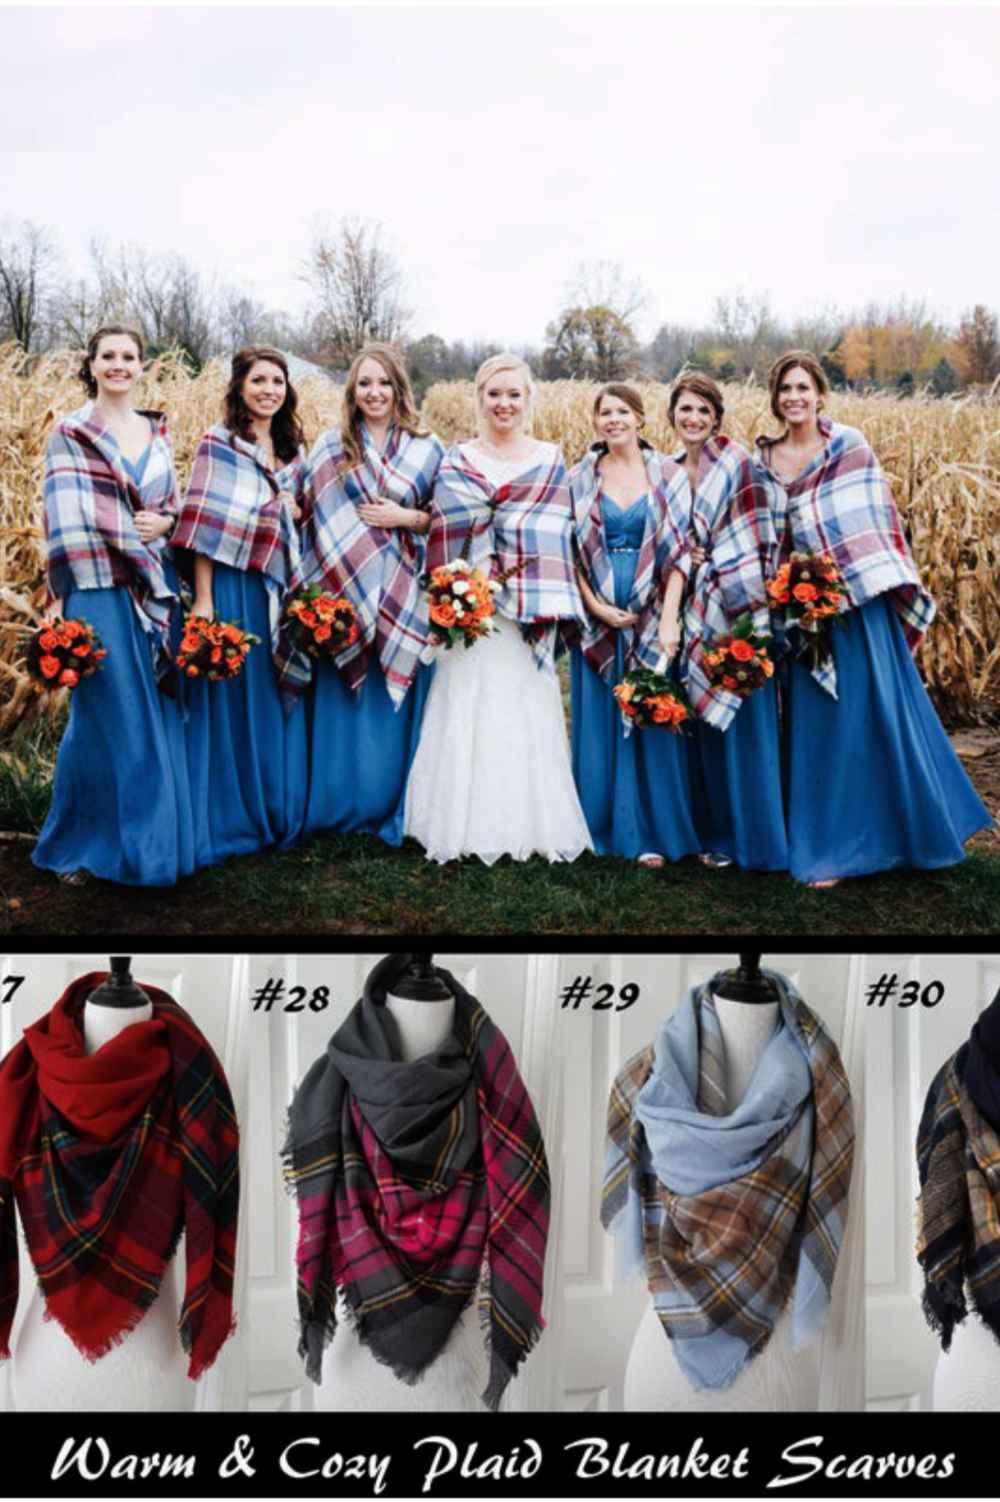 Wedding Blanket Scarves for Bridesmaids